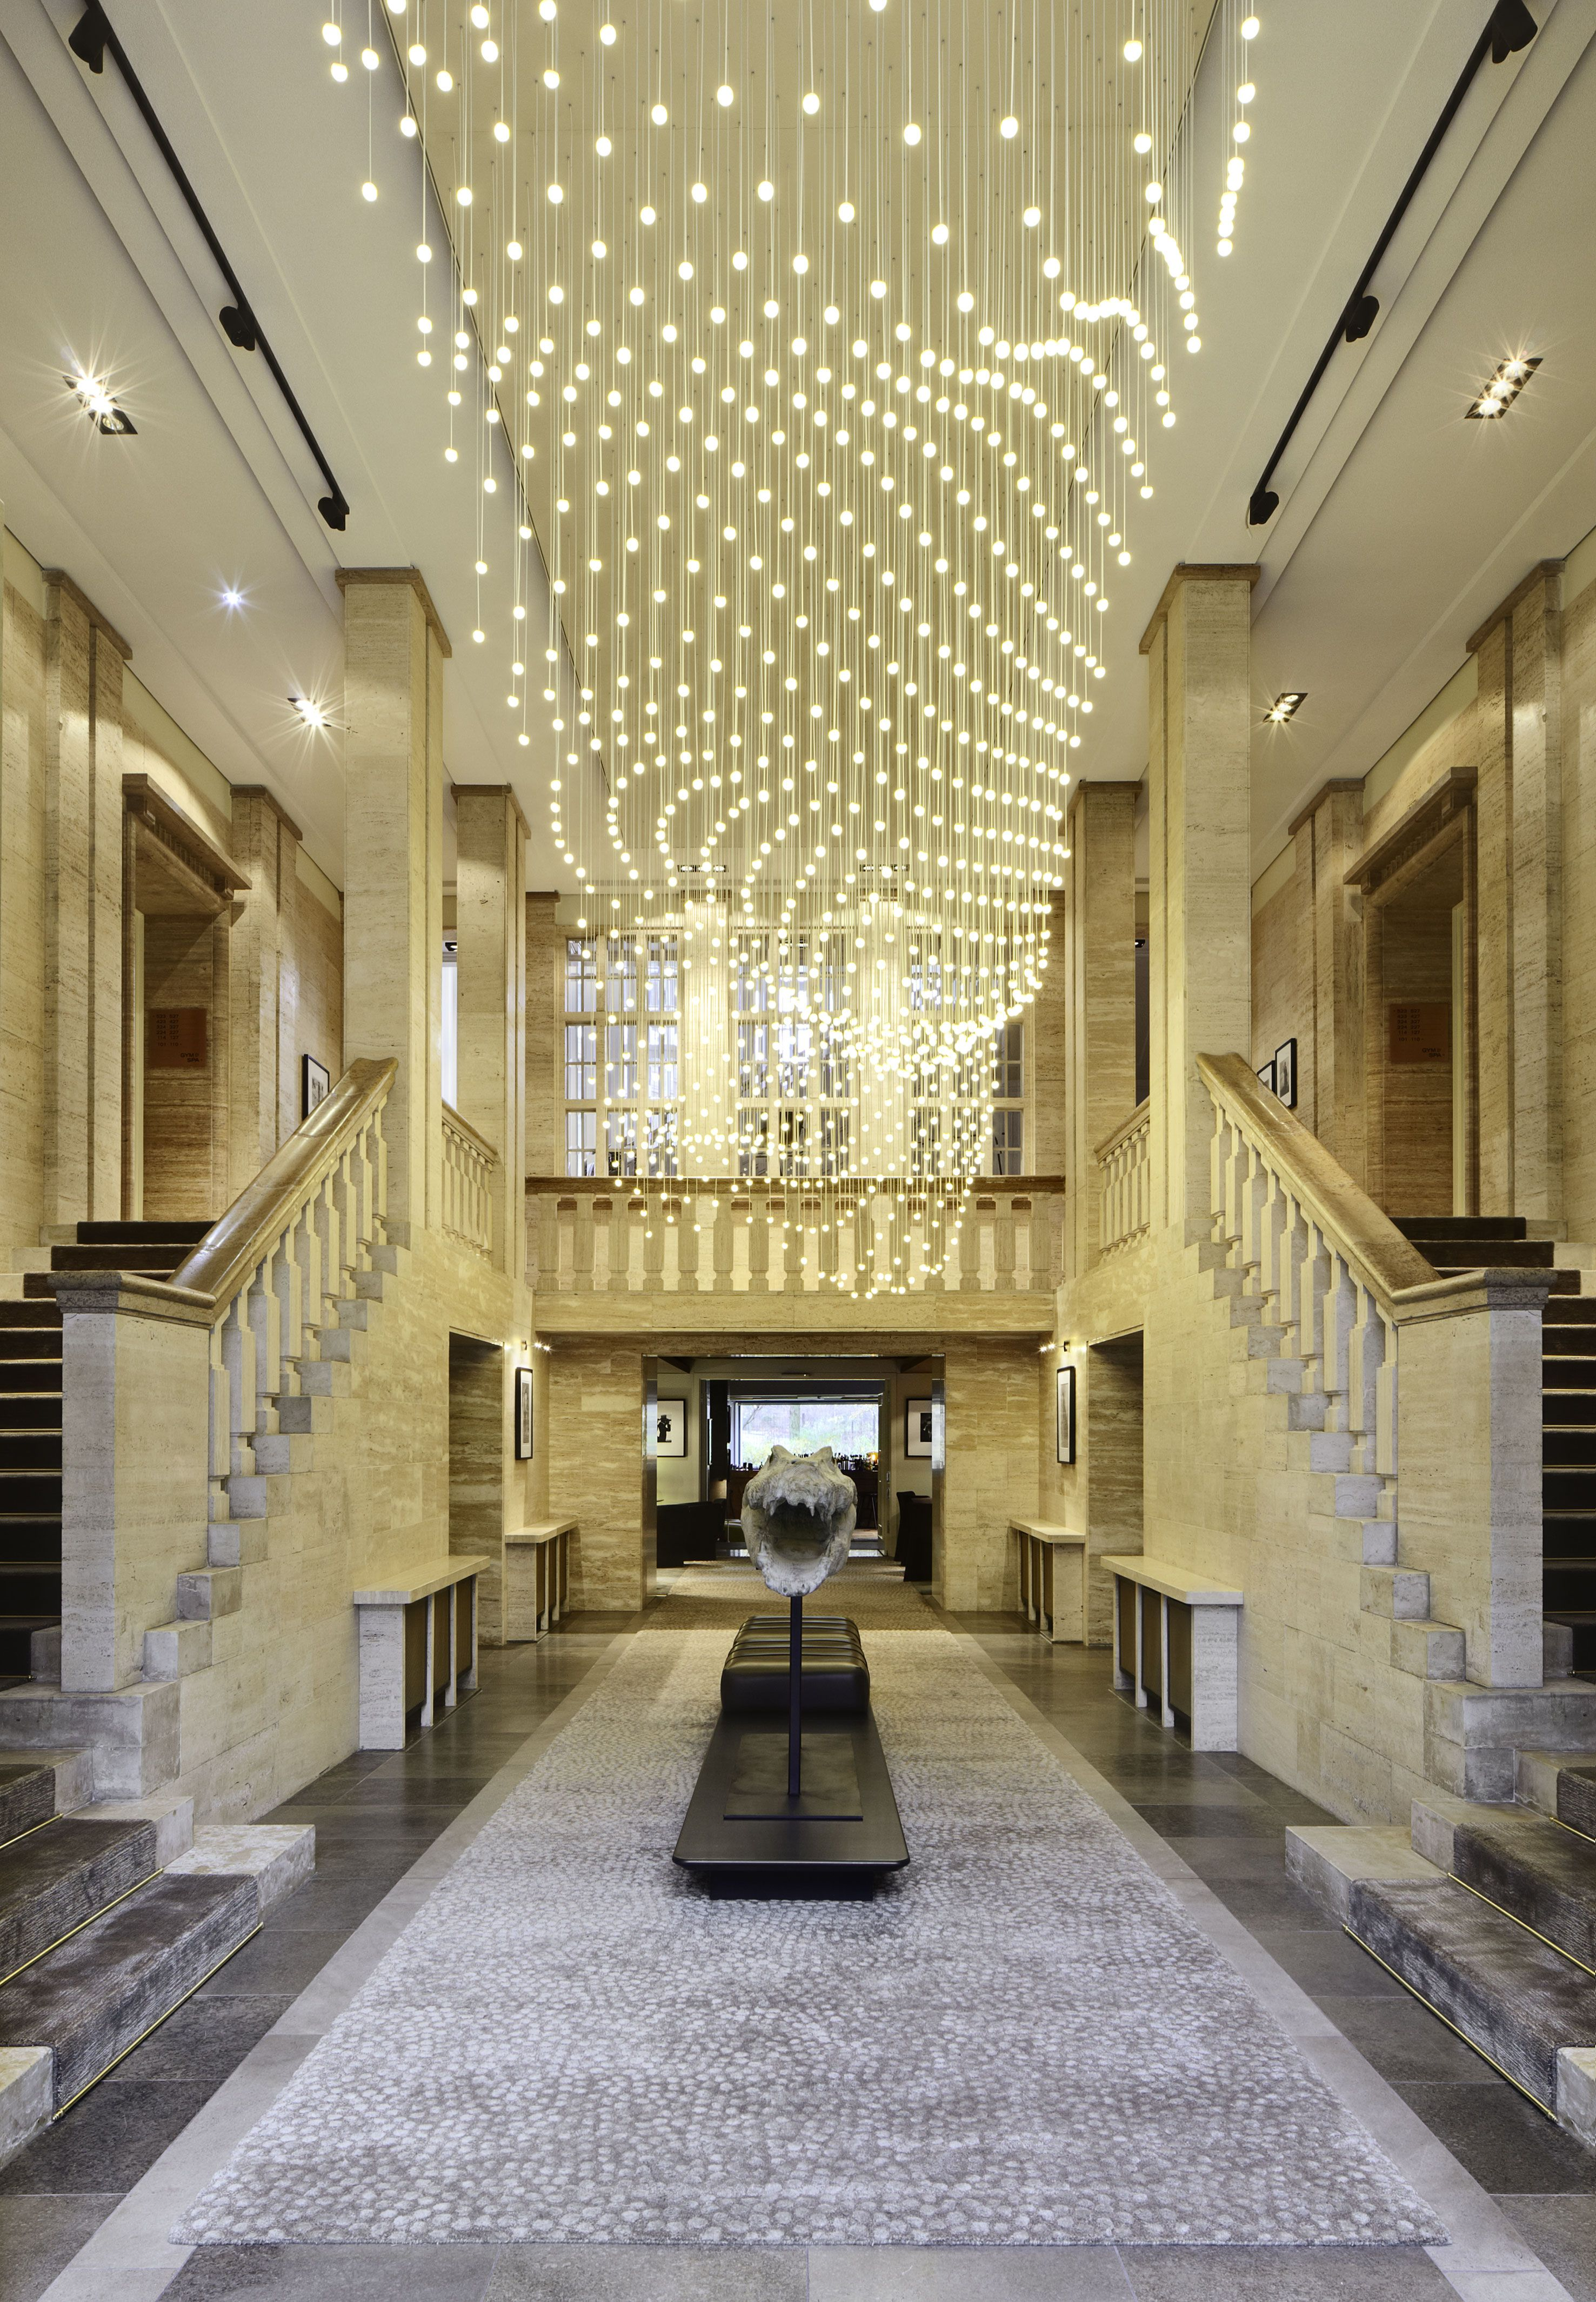 Das stue hotel lobby berlin hotel interiors hotel for Berlino design hotel